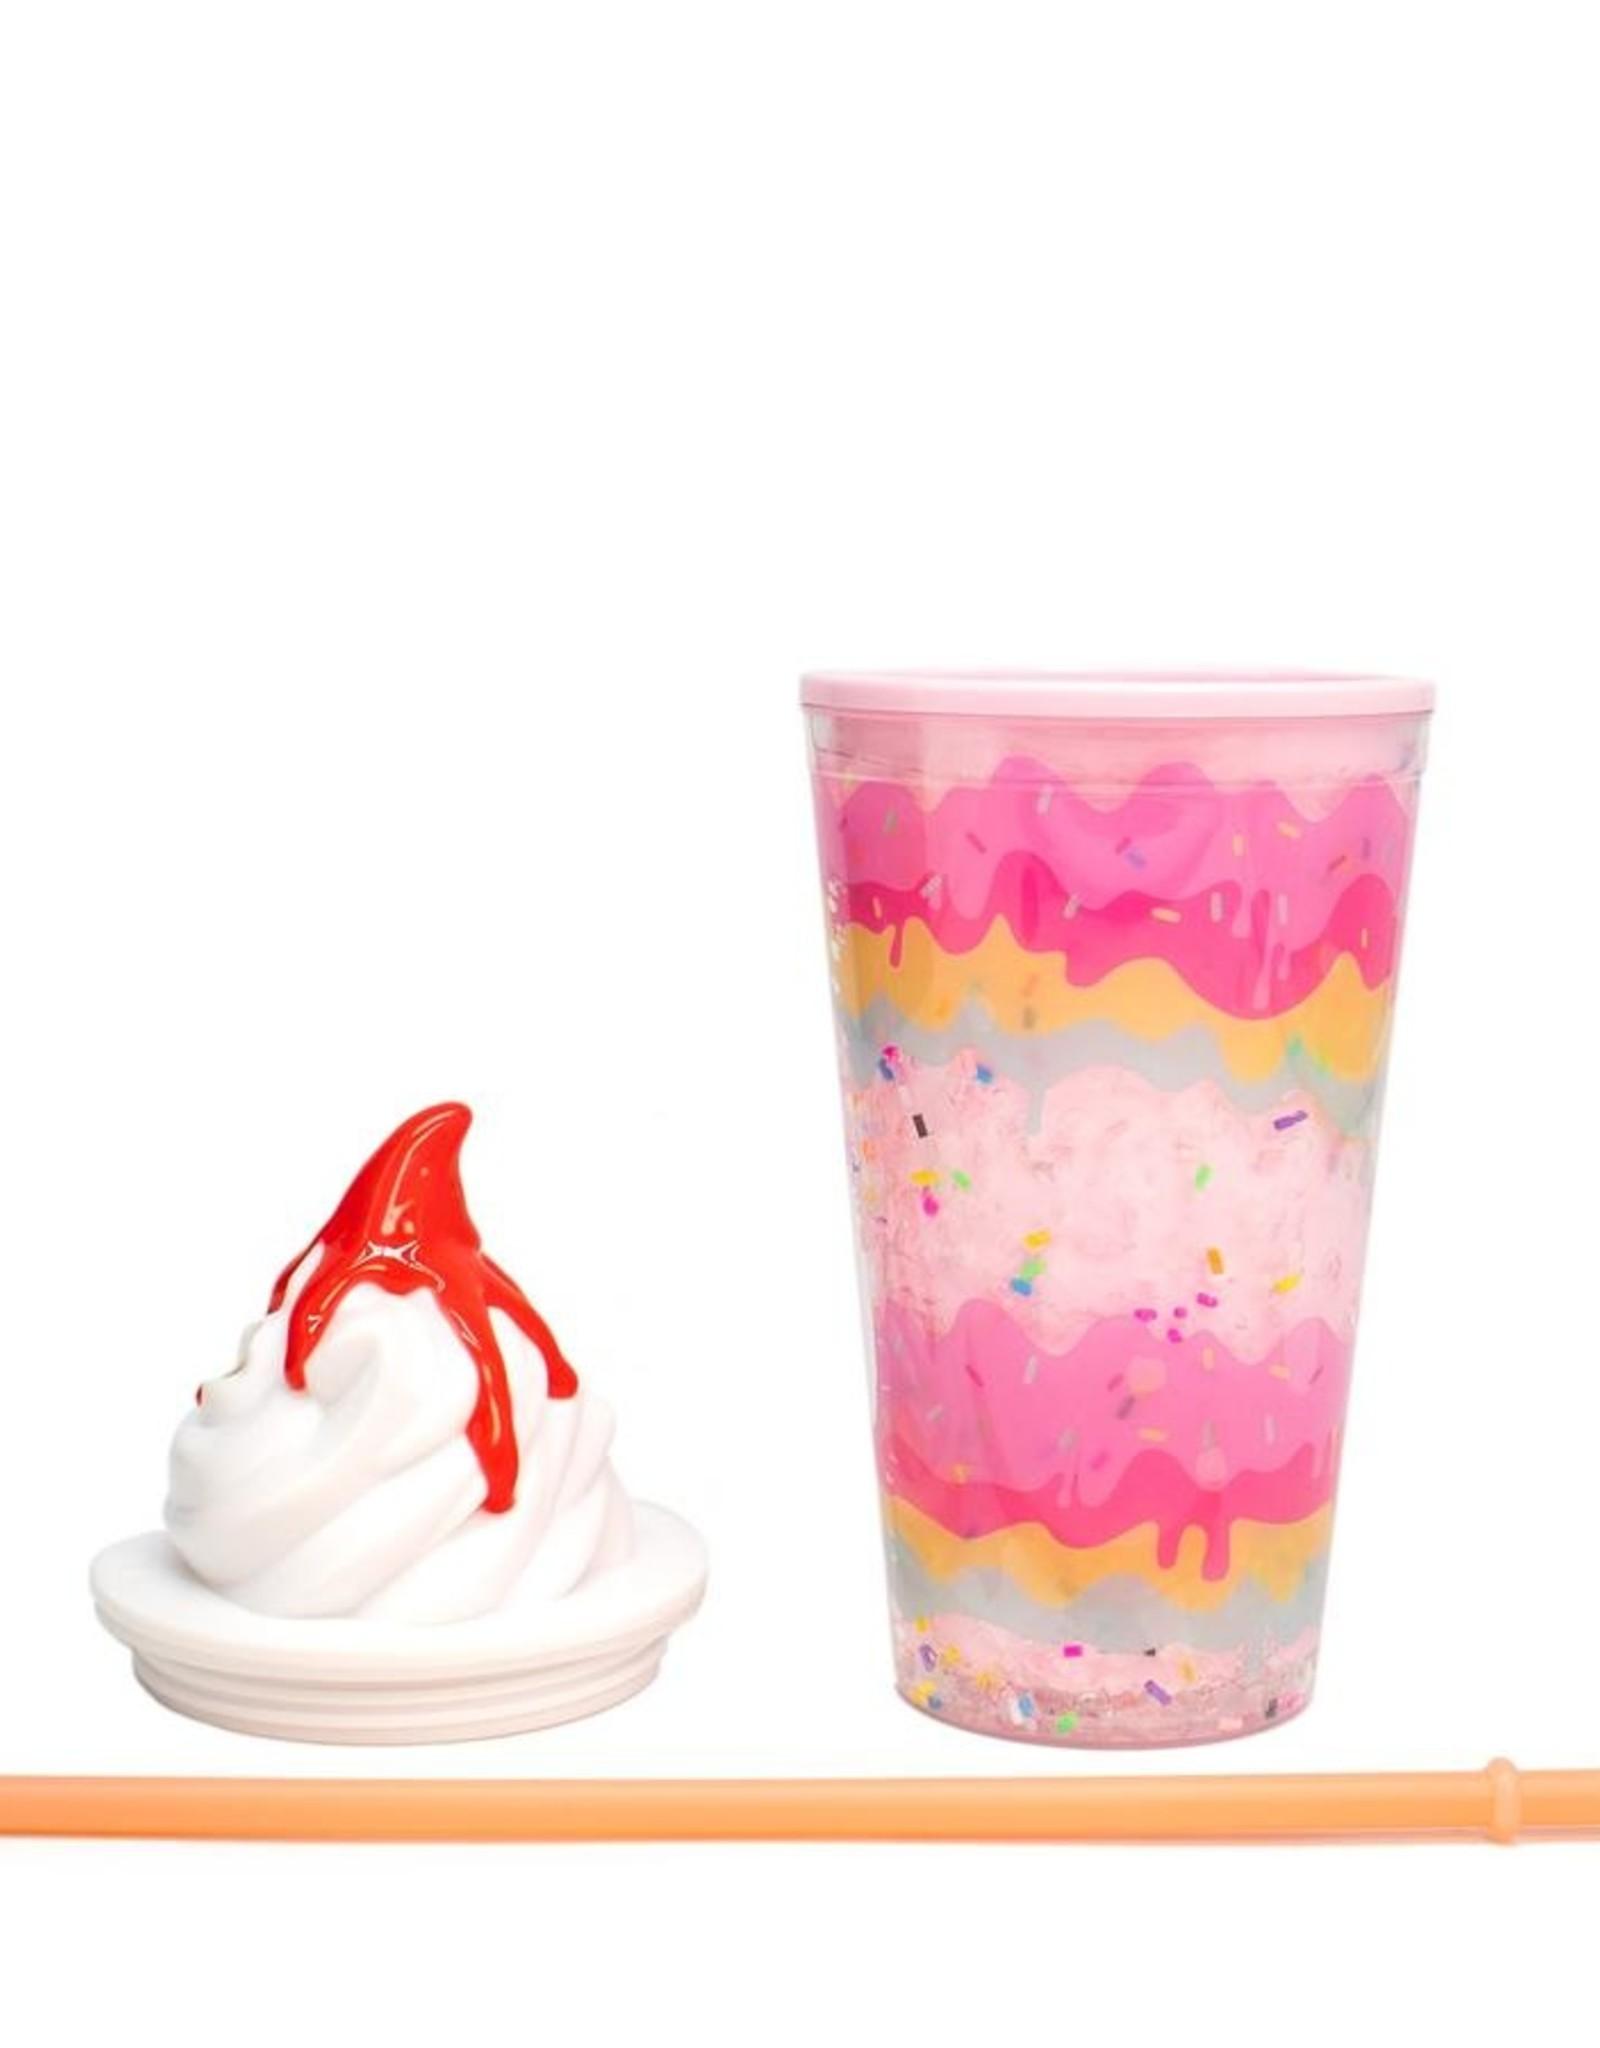 Bewaltz Layered Soft Serve Ice Cream Tumbler